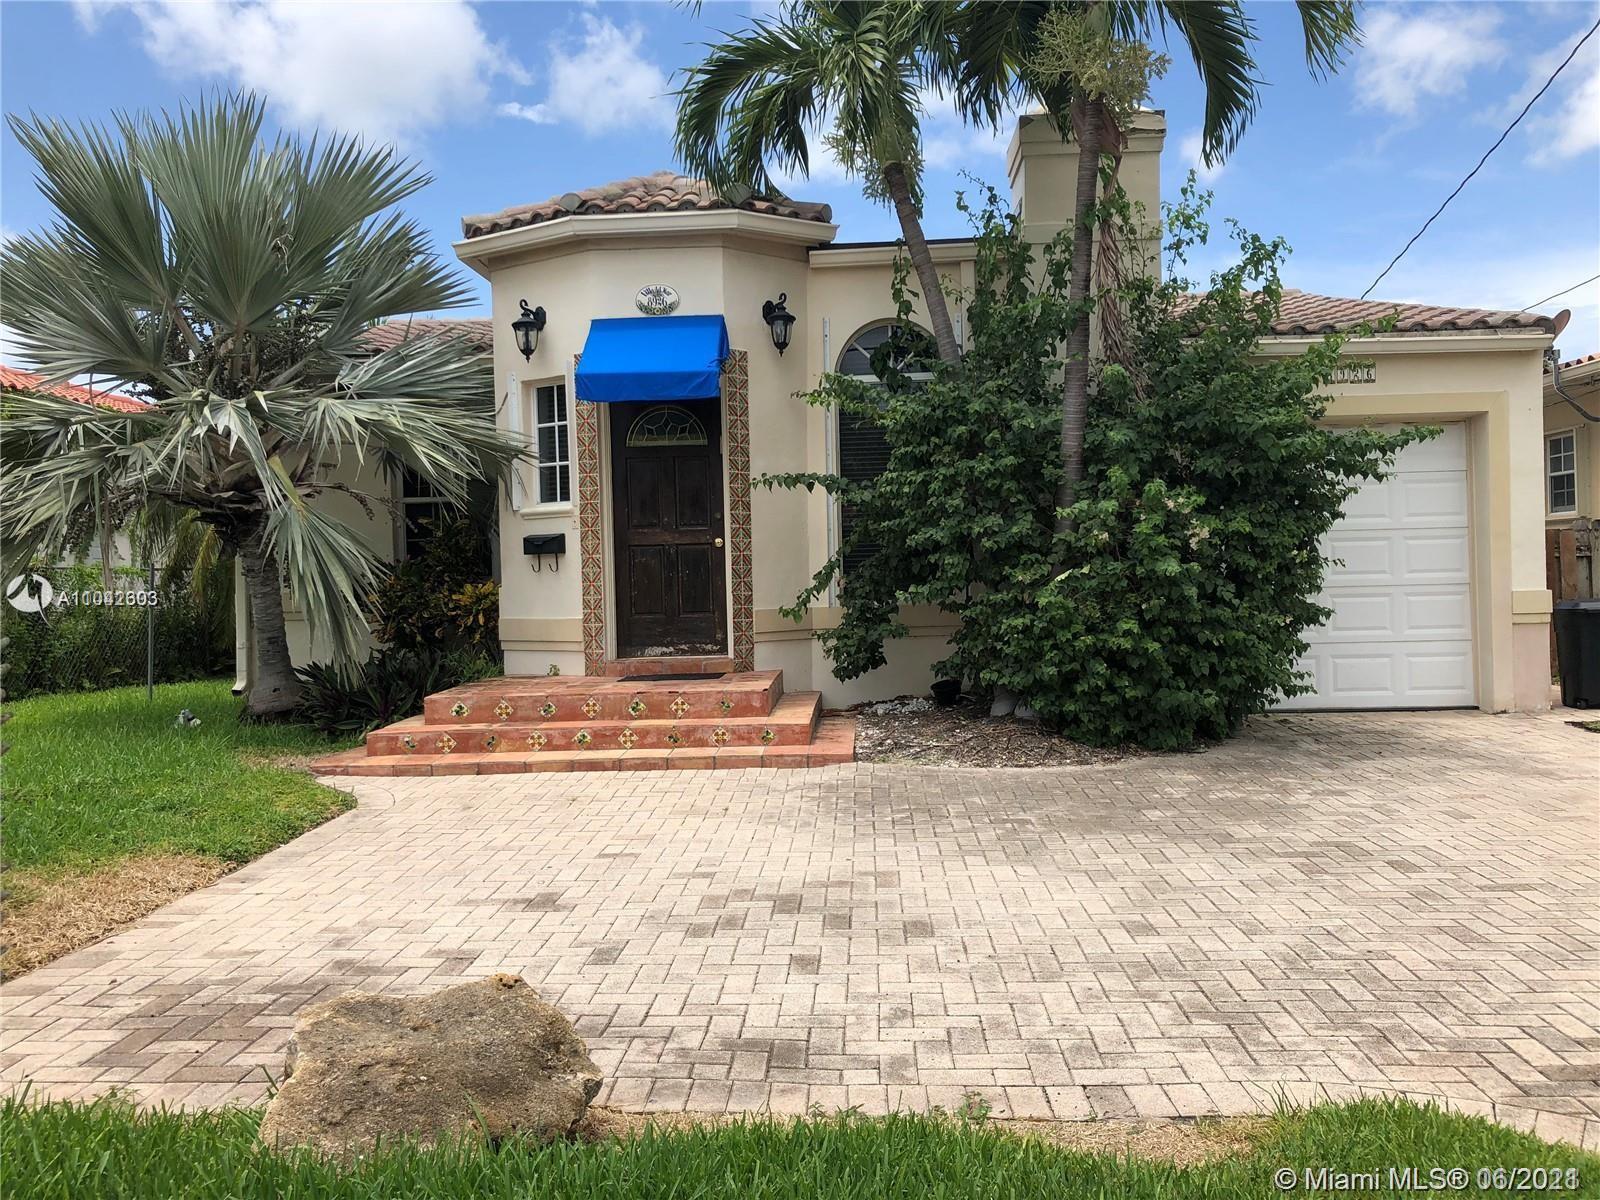 8926 Emerson Ave, Surfside, Florida 33154